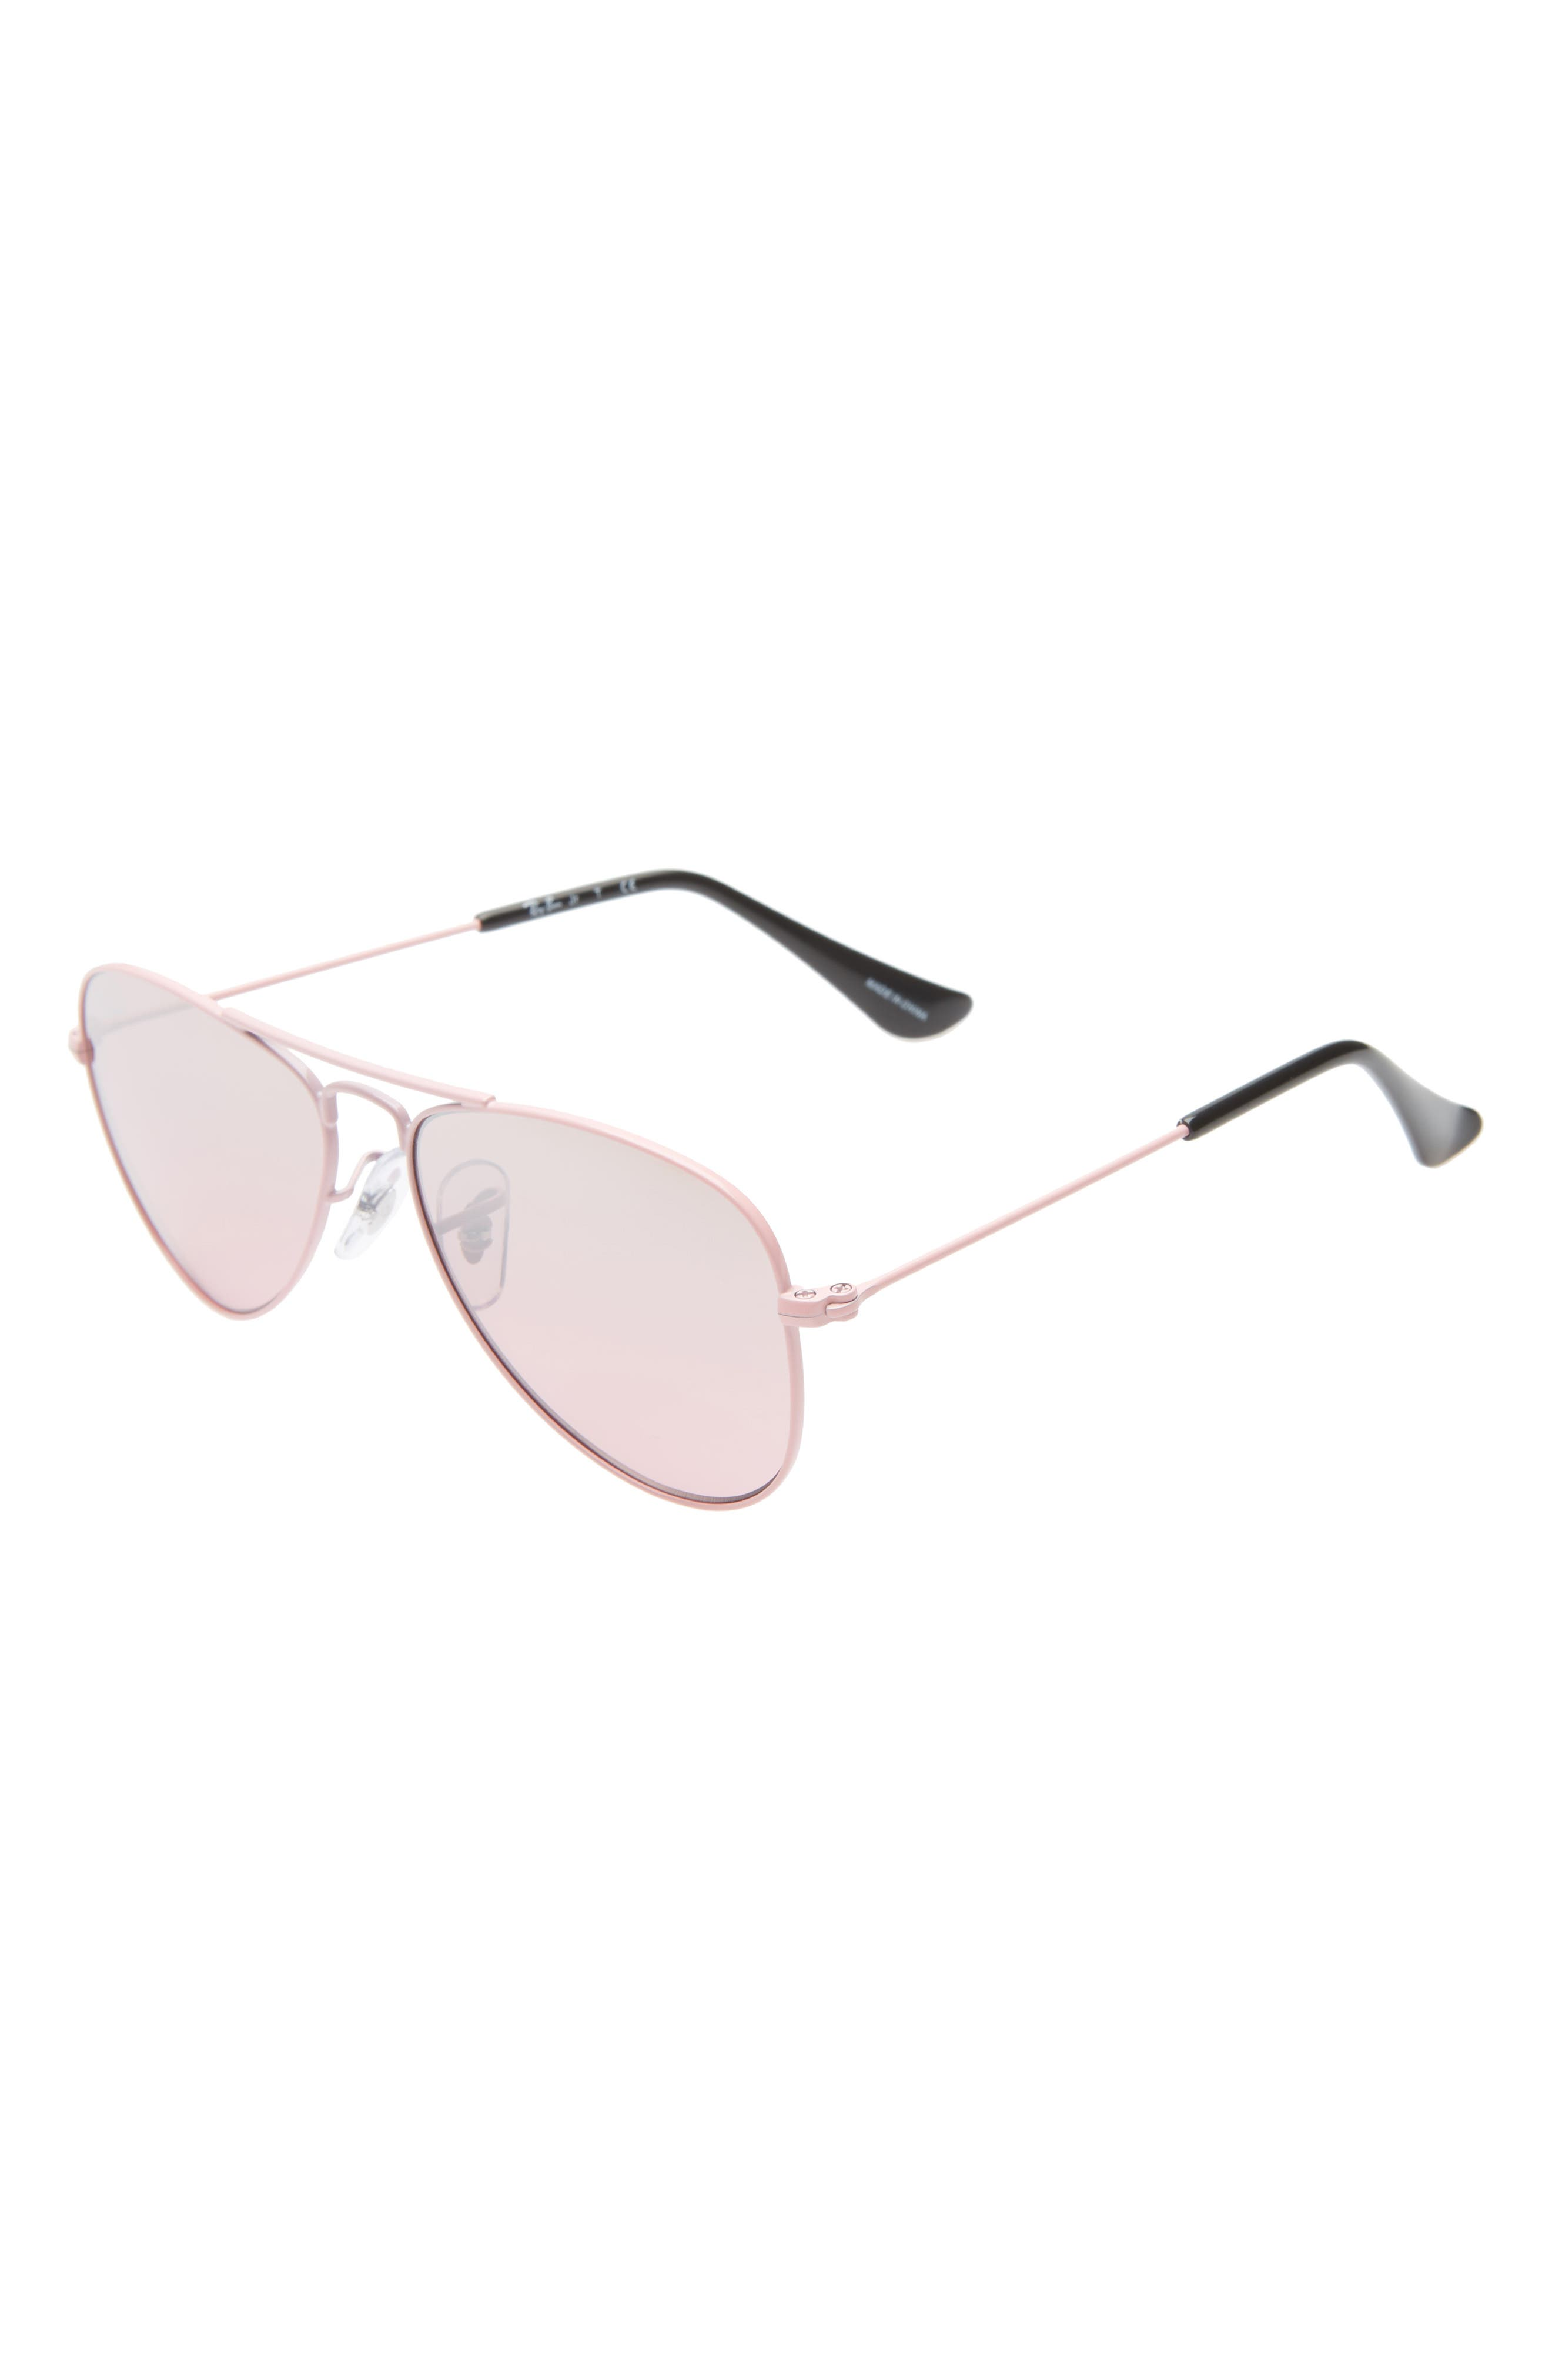 7274040713bae Boys  Sunglasses   Goggles Accessories  Belts